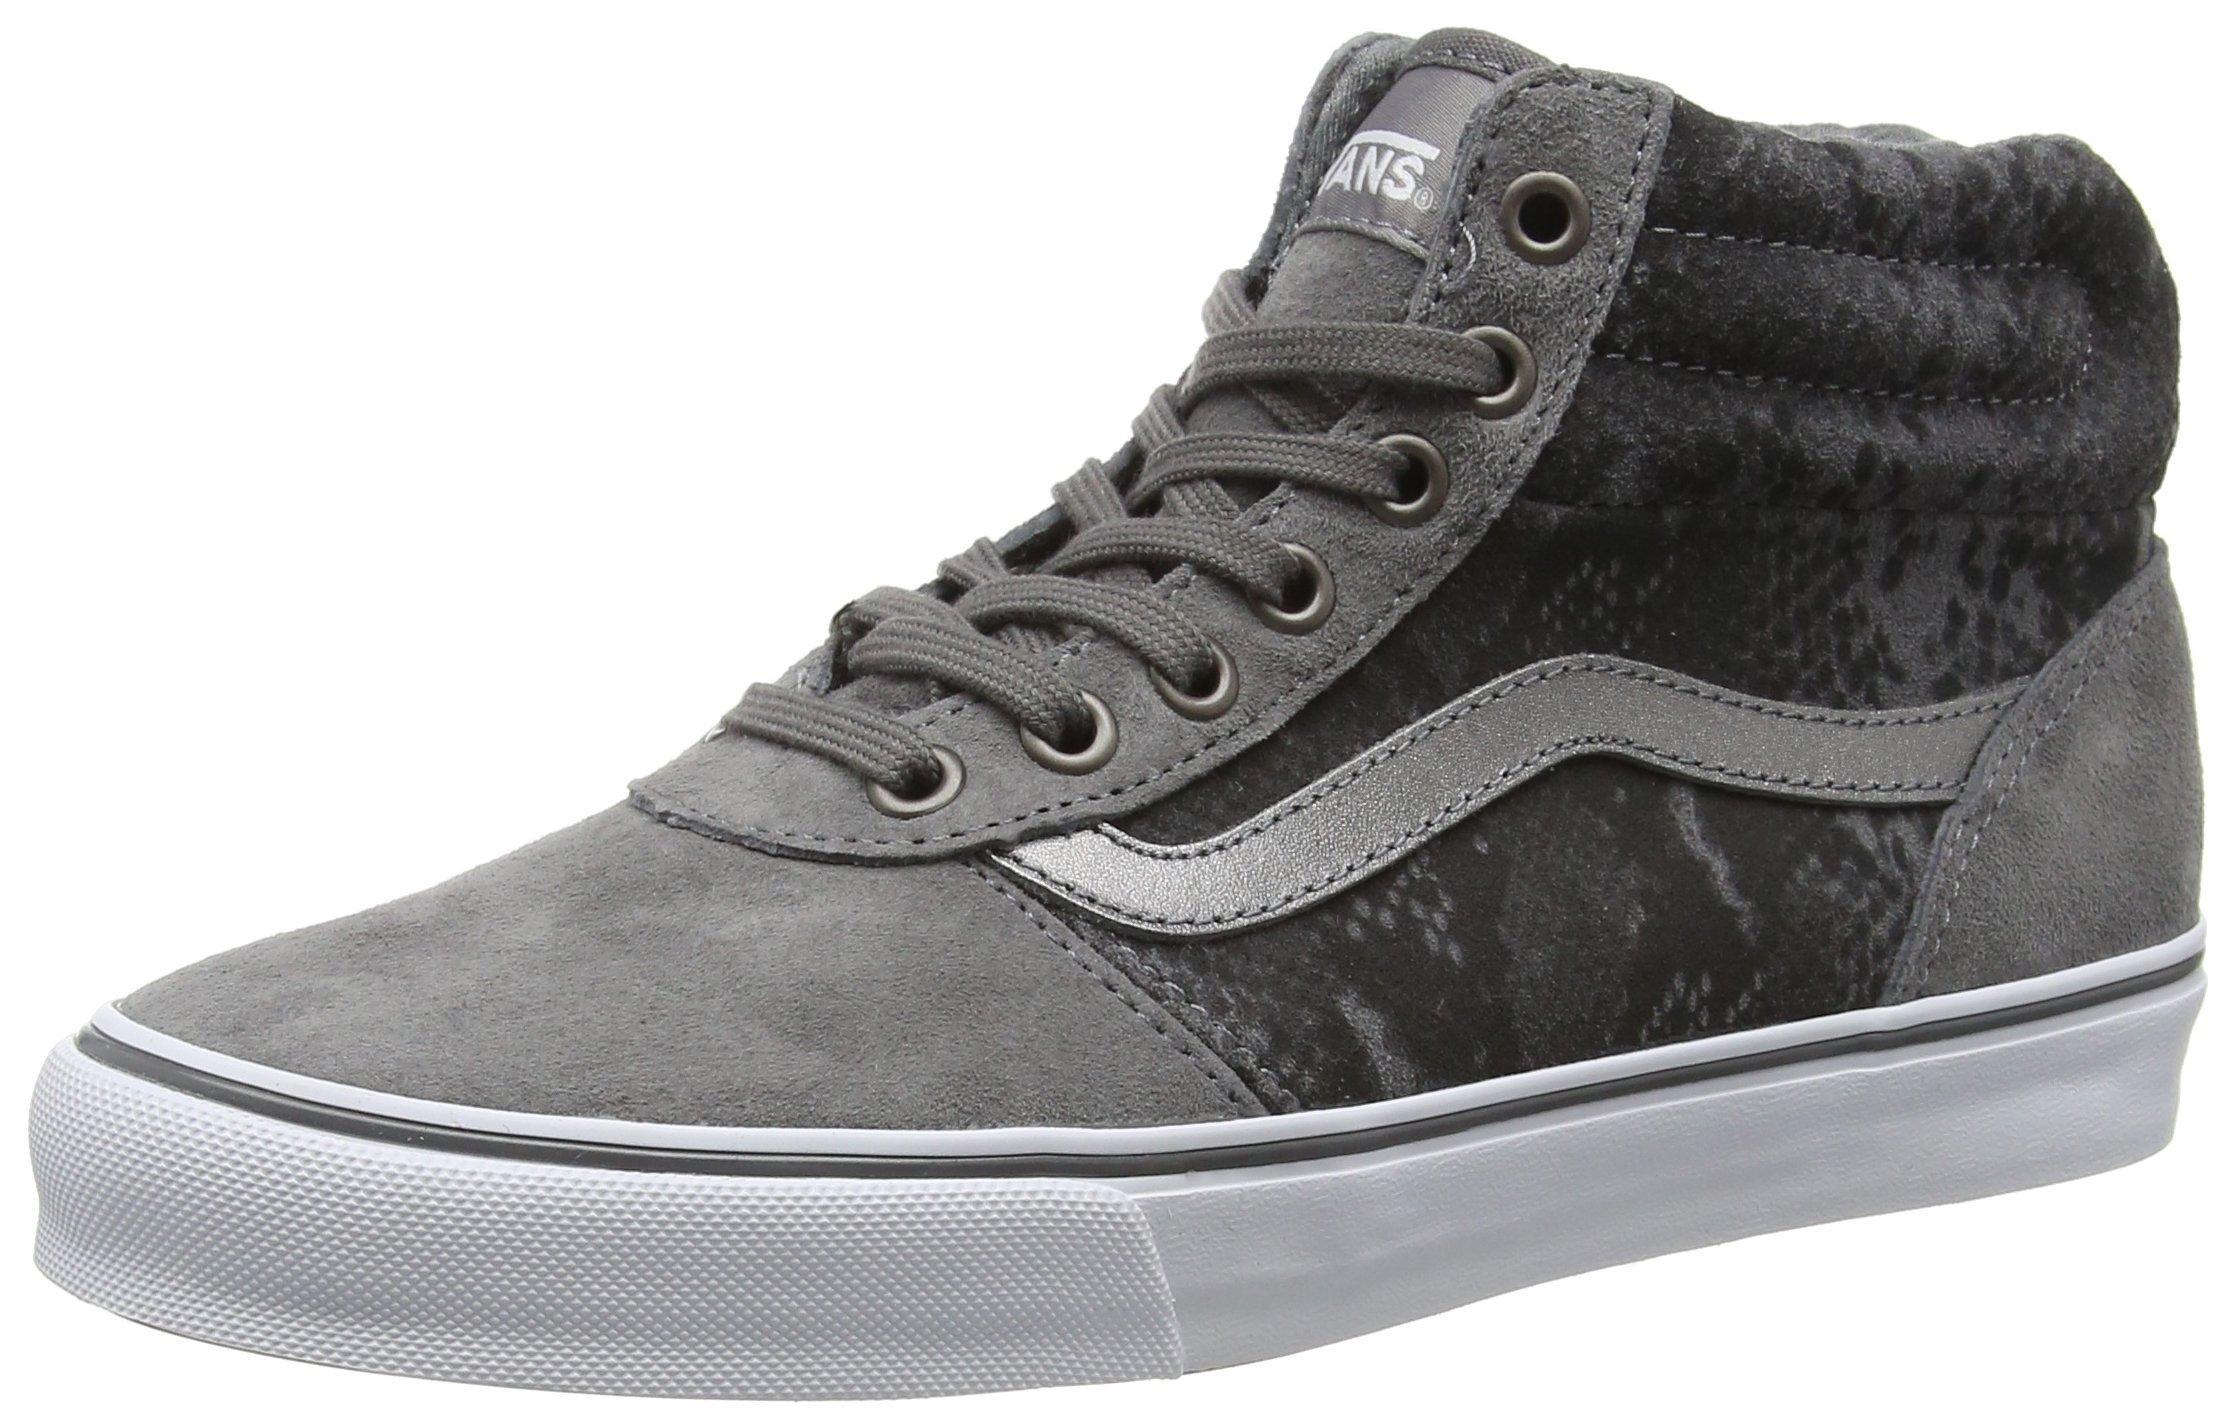 HiSneakers 5 Eu Milton tan36 Gray FemmeGrismte Vans Hautes Snake tsQxhrdCB